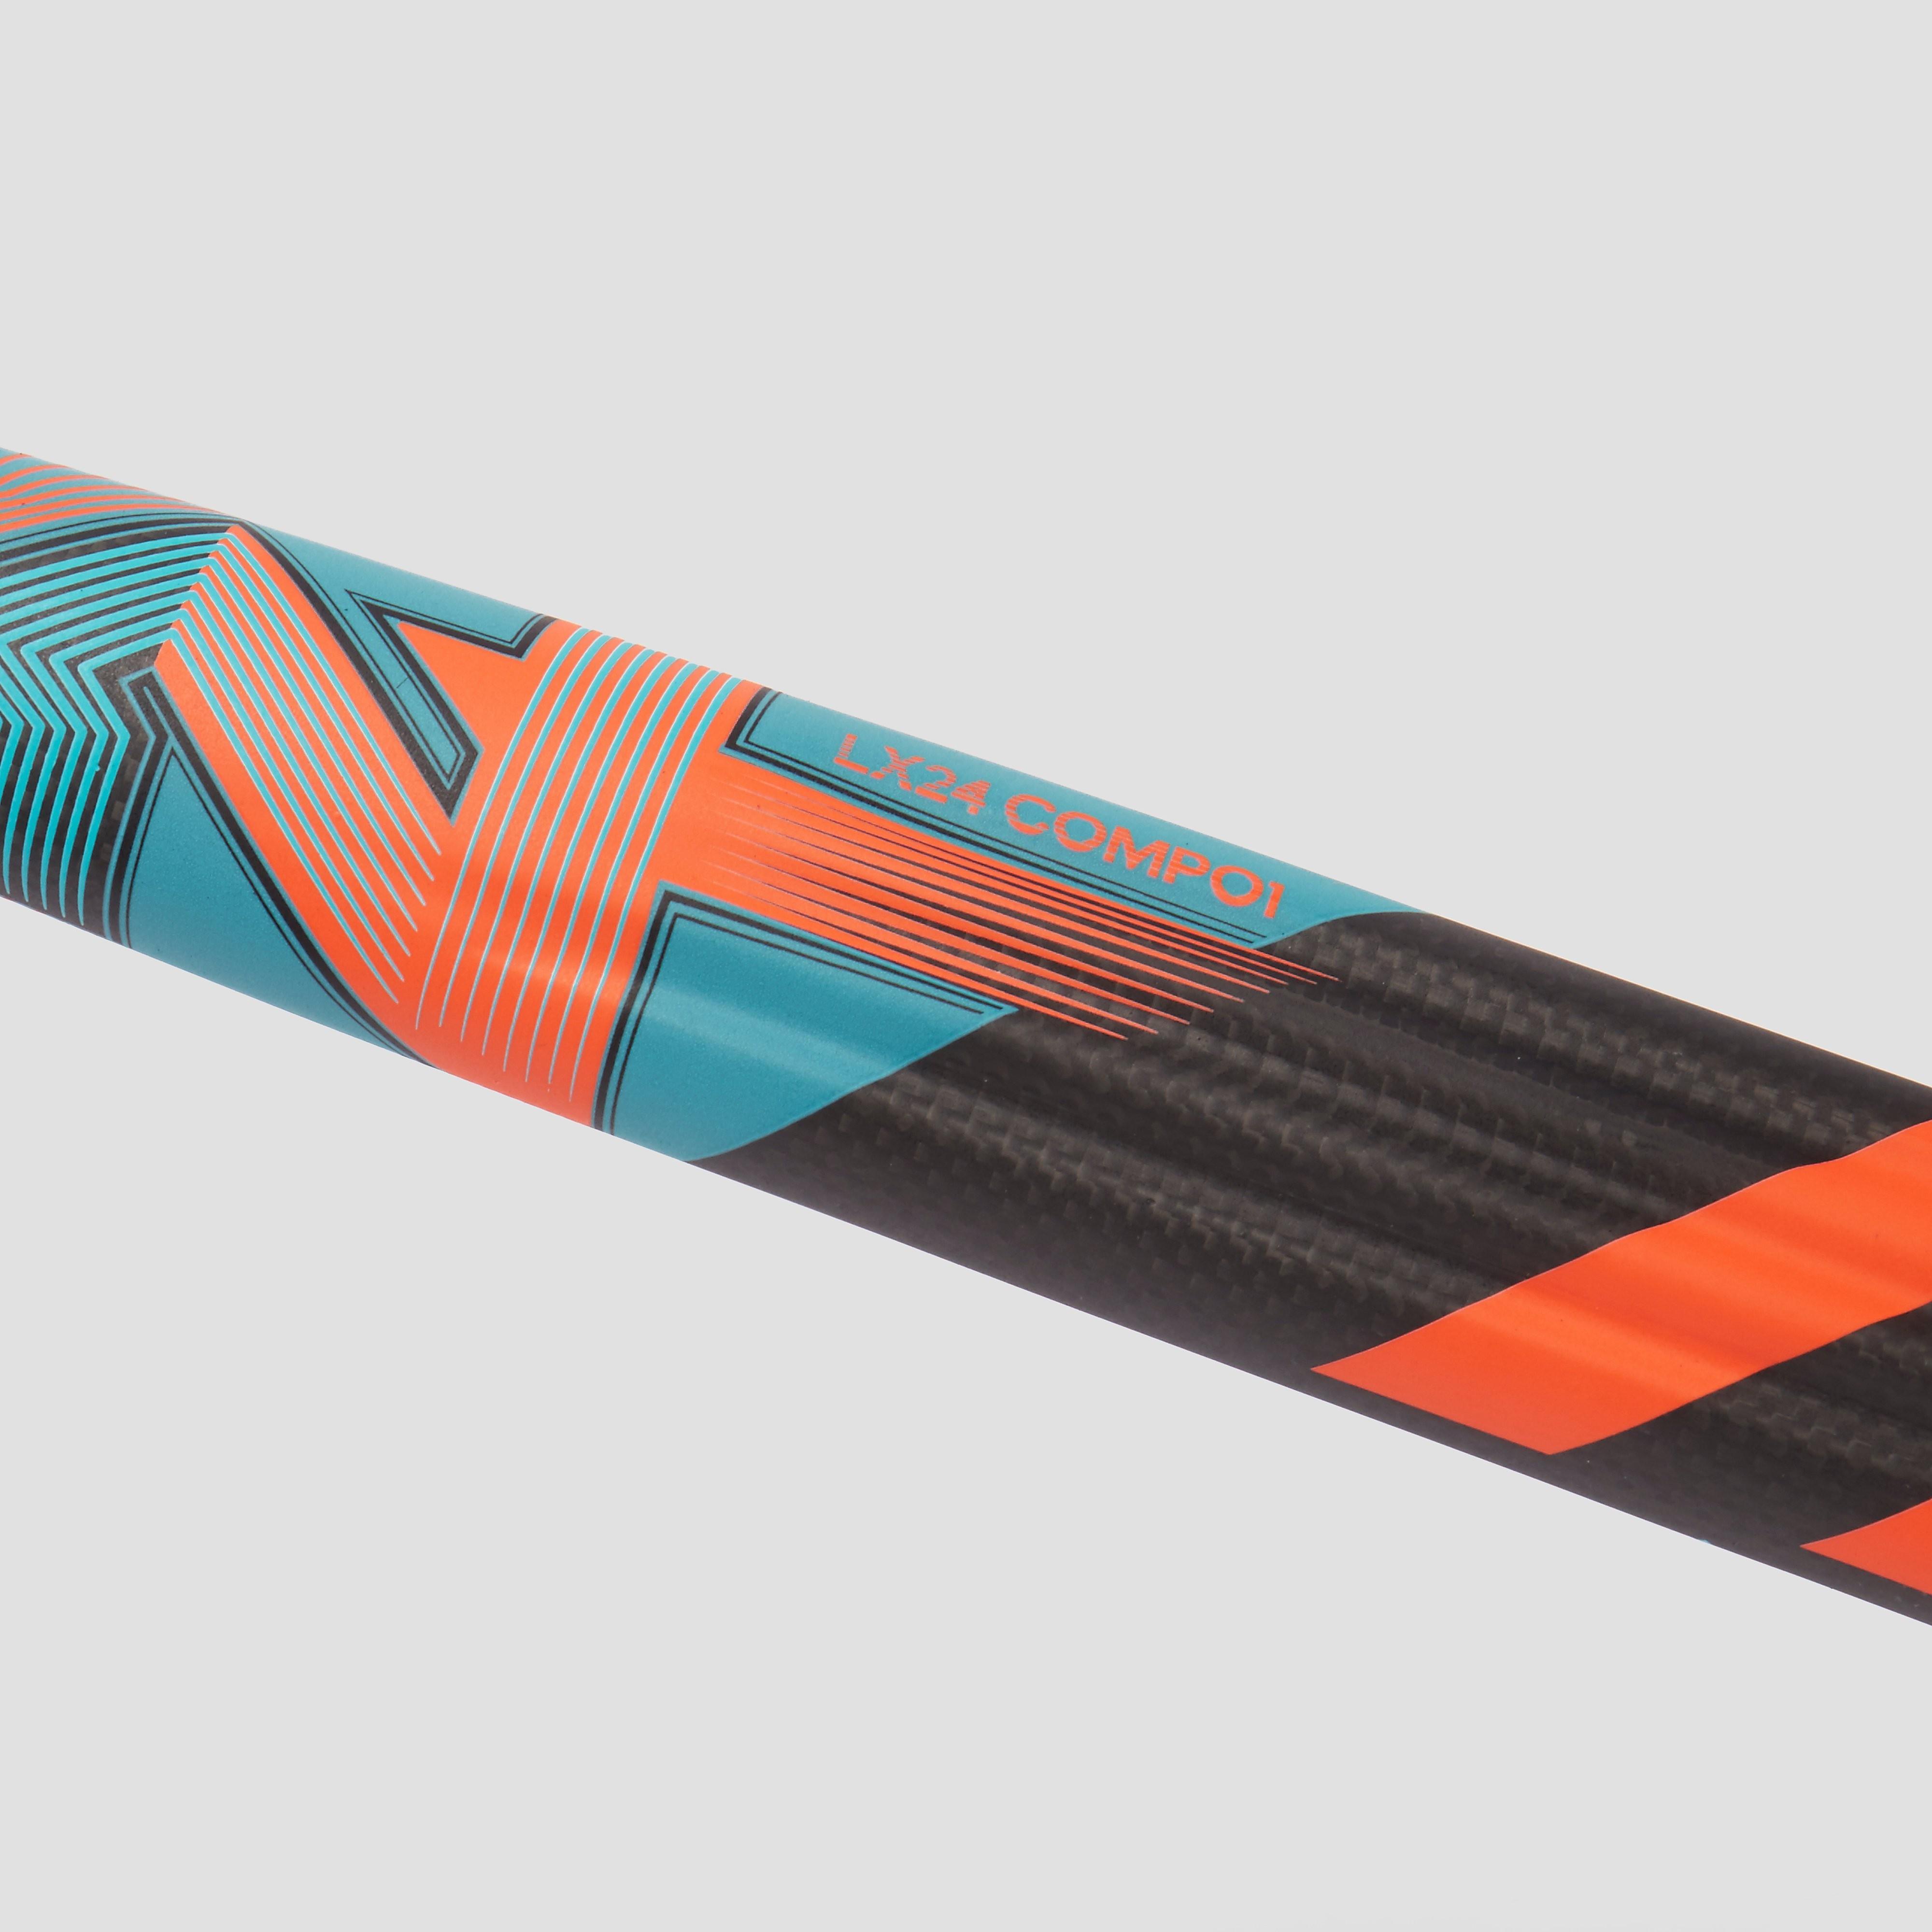 adidas LX24 Compo 1 Hockey Stick